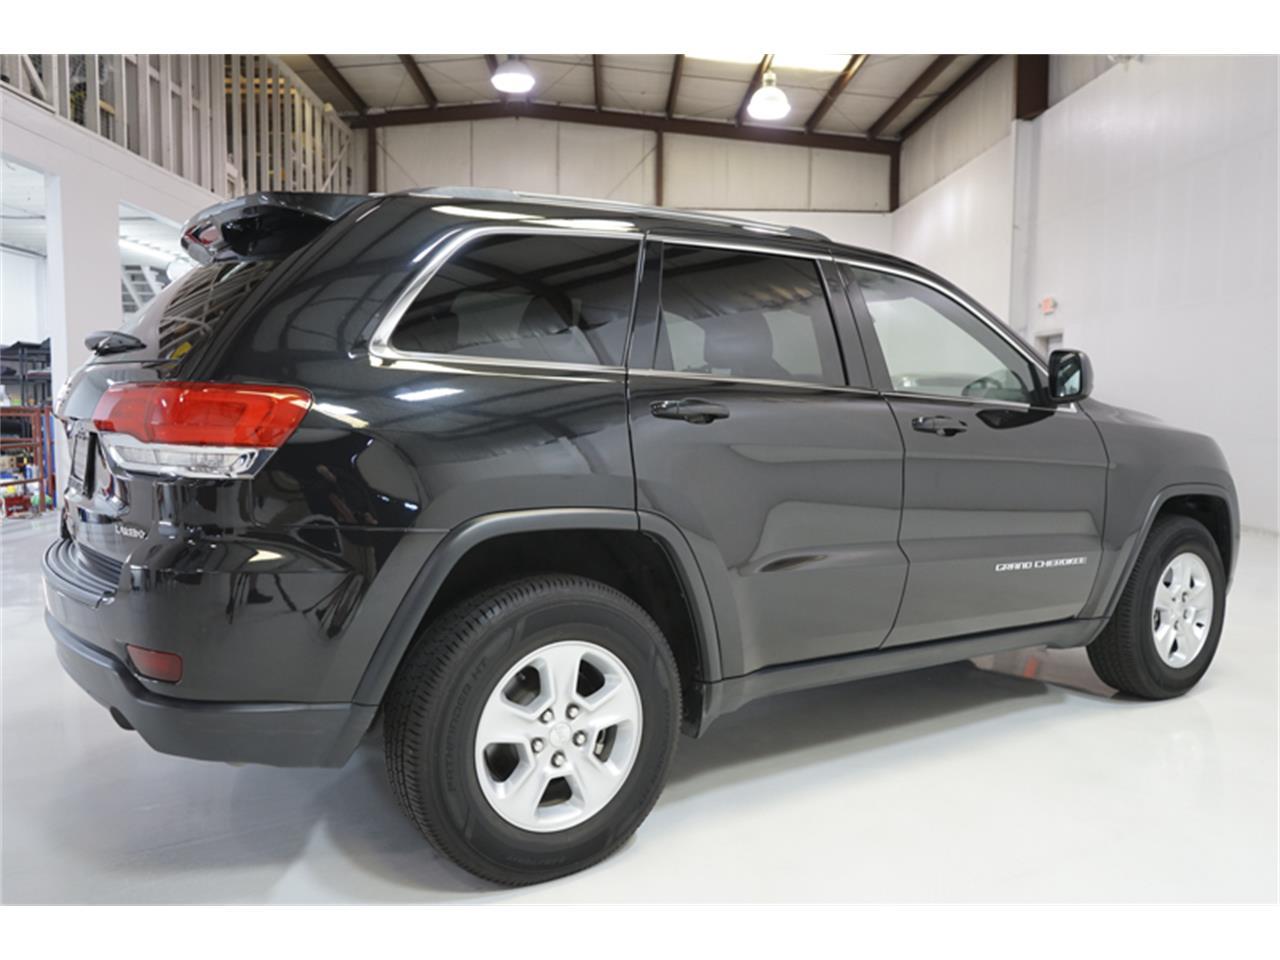 2015 Jeep Grand Cherokee (CC-1359270) for sale in Saint Ann, Missouri